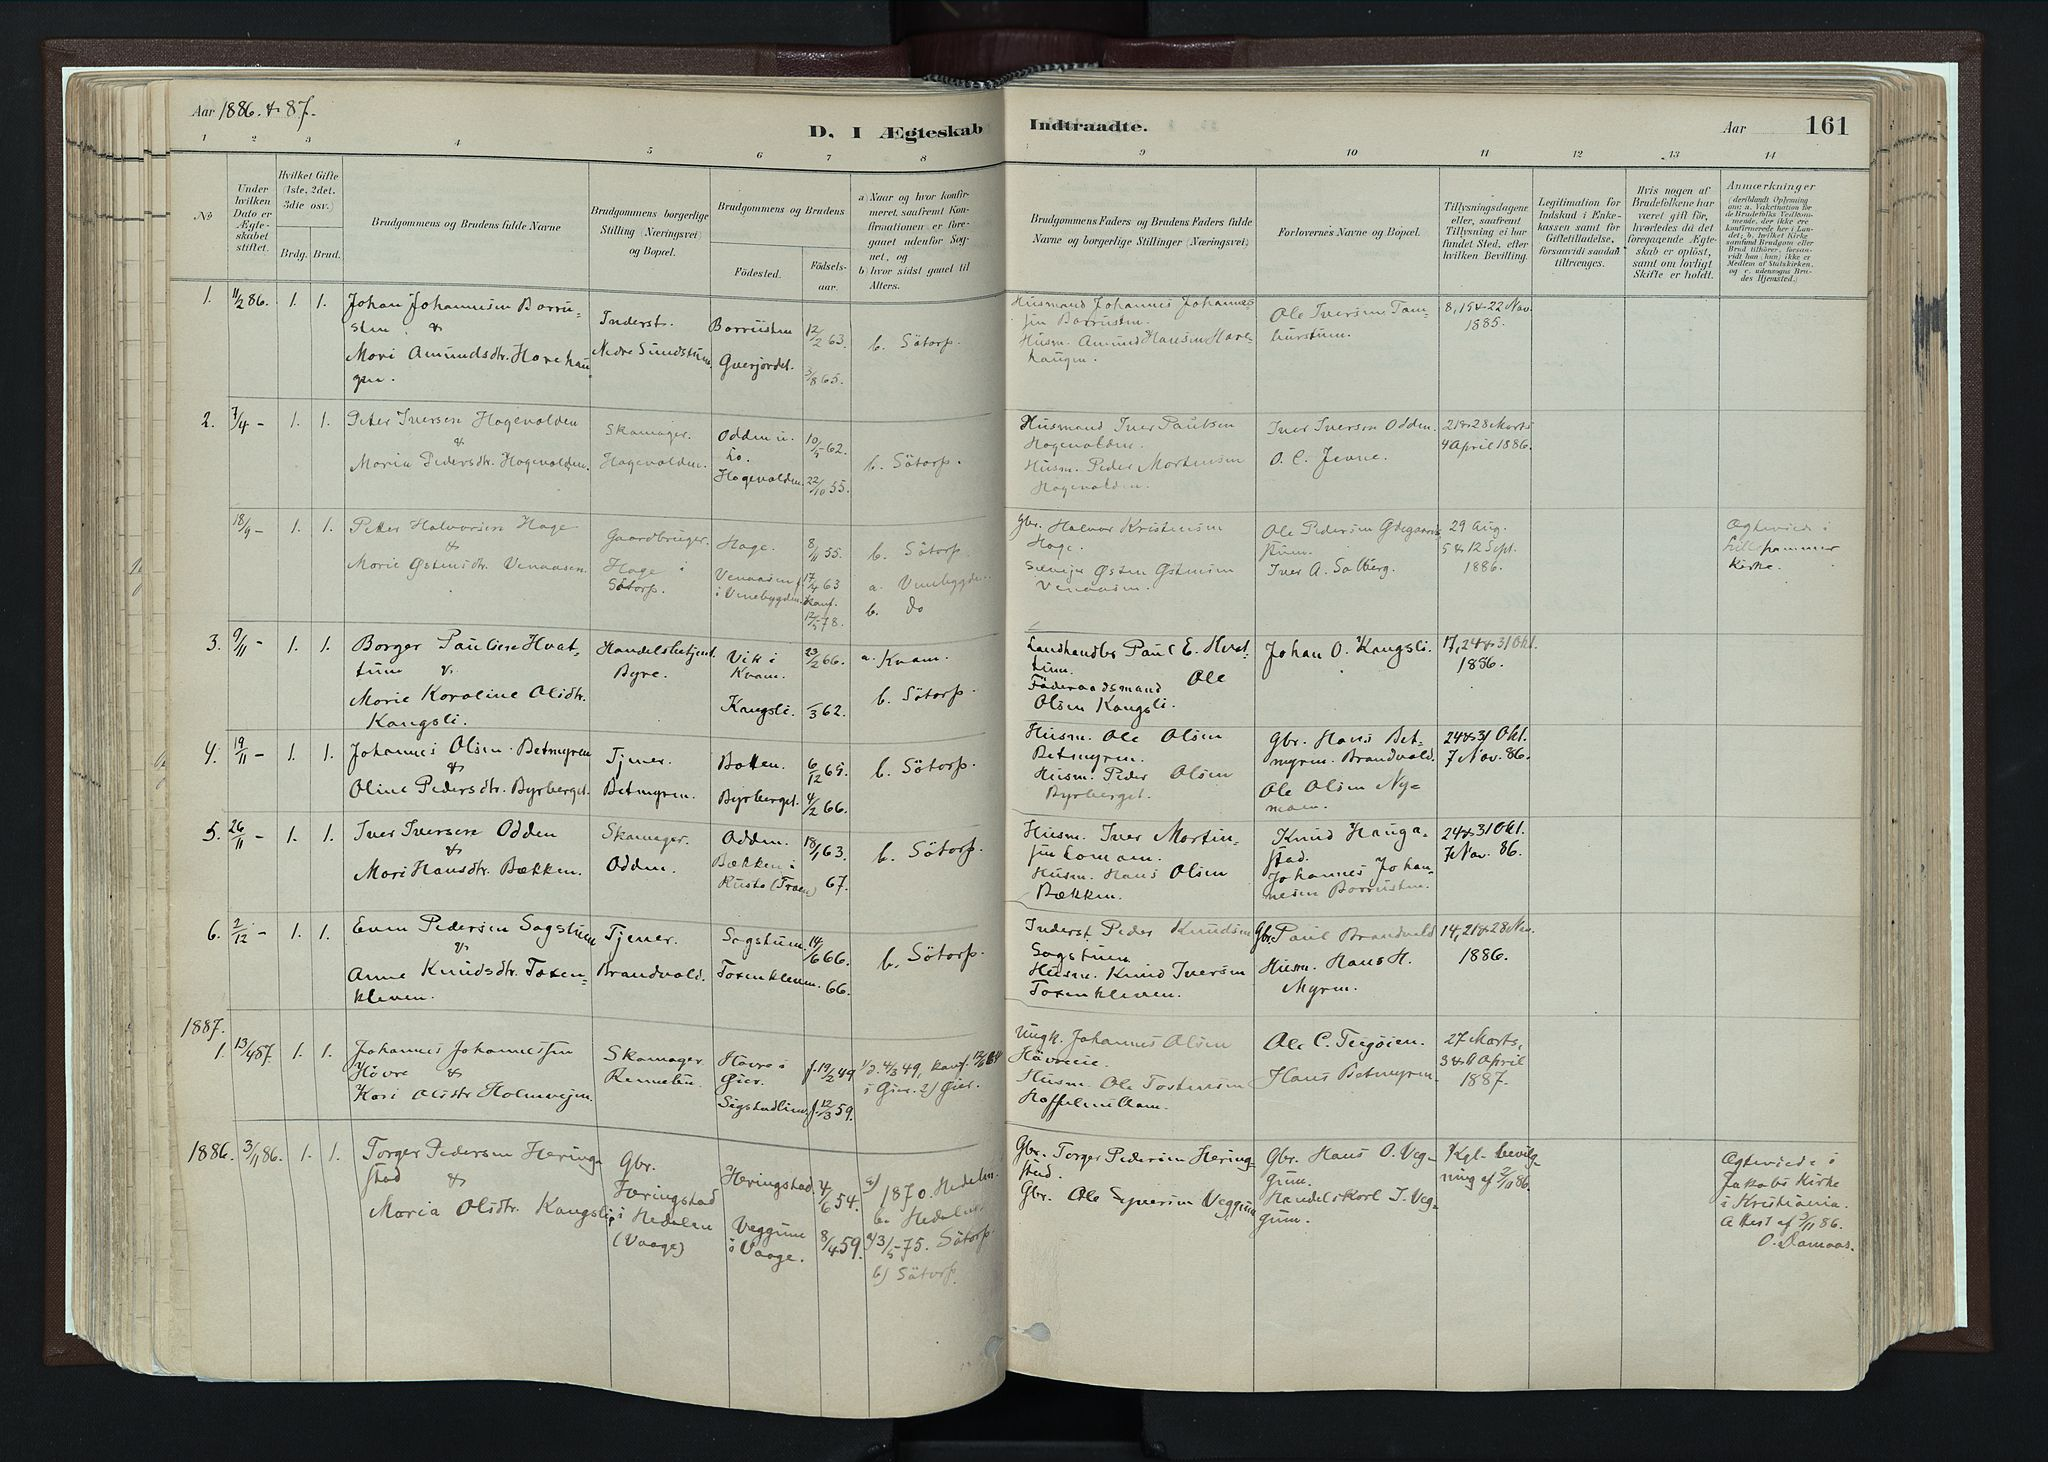 SAH, Nord-Fron prestekontor, Ministerialbok nr. 4, 1884-1914, s. 161